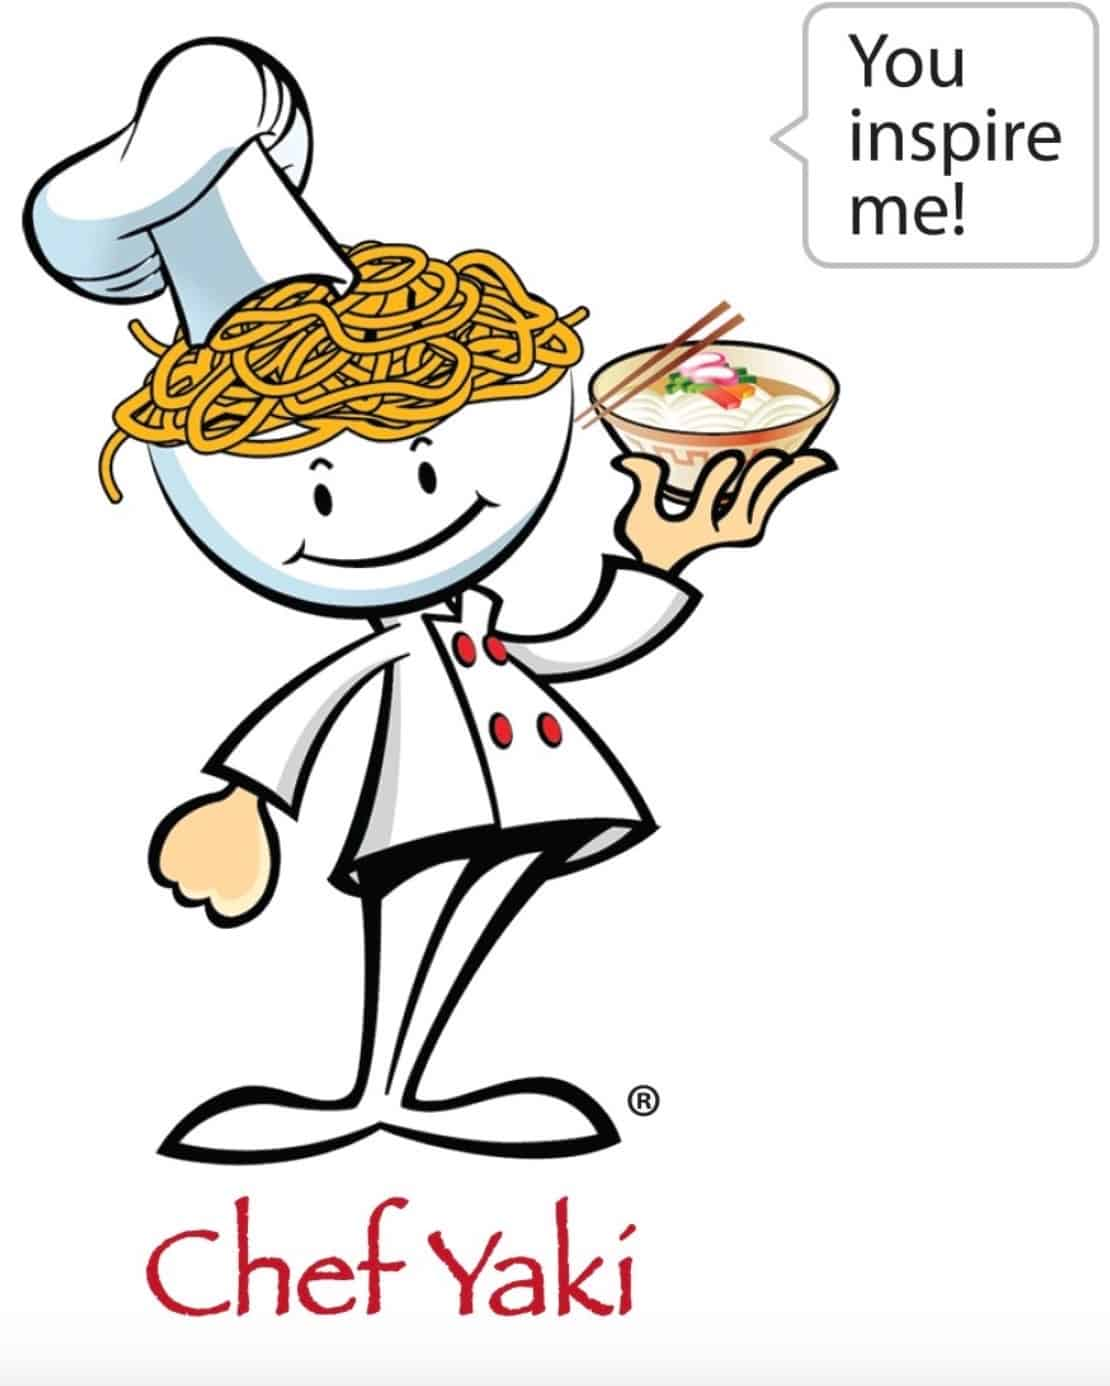 chef yaki logo